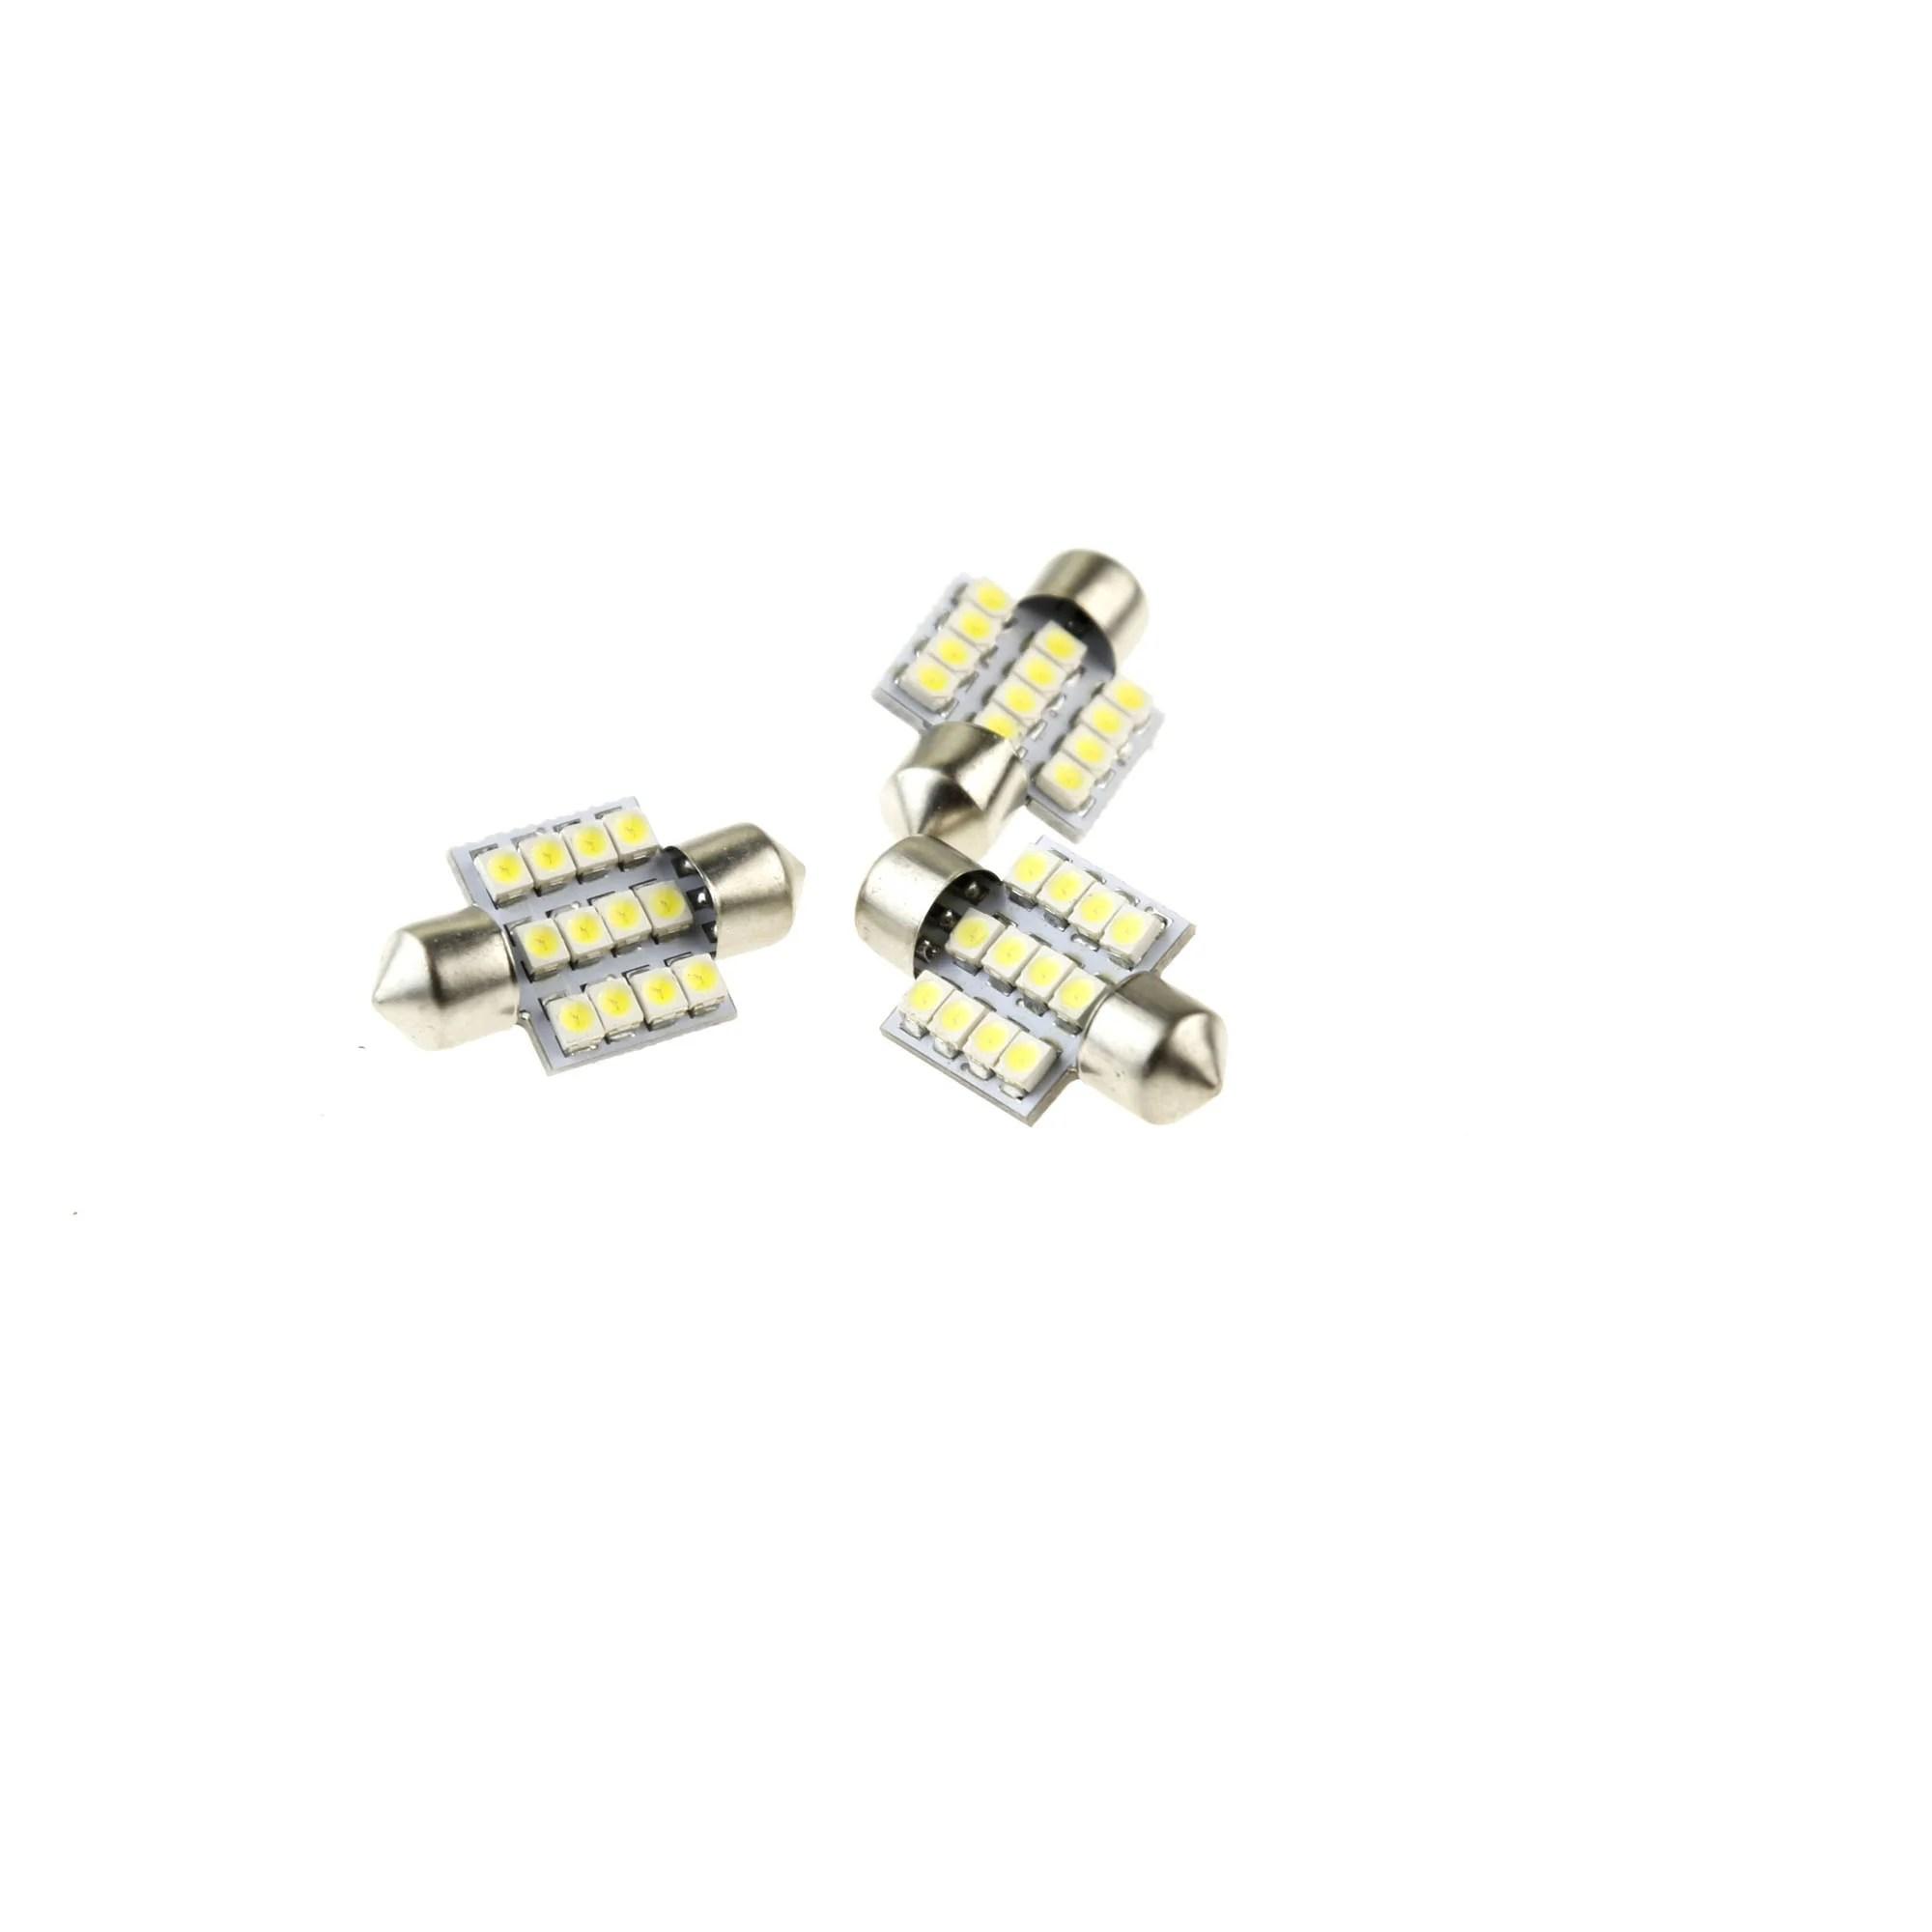 interior lighting subaru wrx led lights fastwrx com subaru wrx shifter subaru wrx interior illumination wiring [ 2000 x 2000 Pixel ]